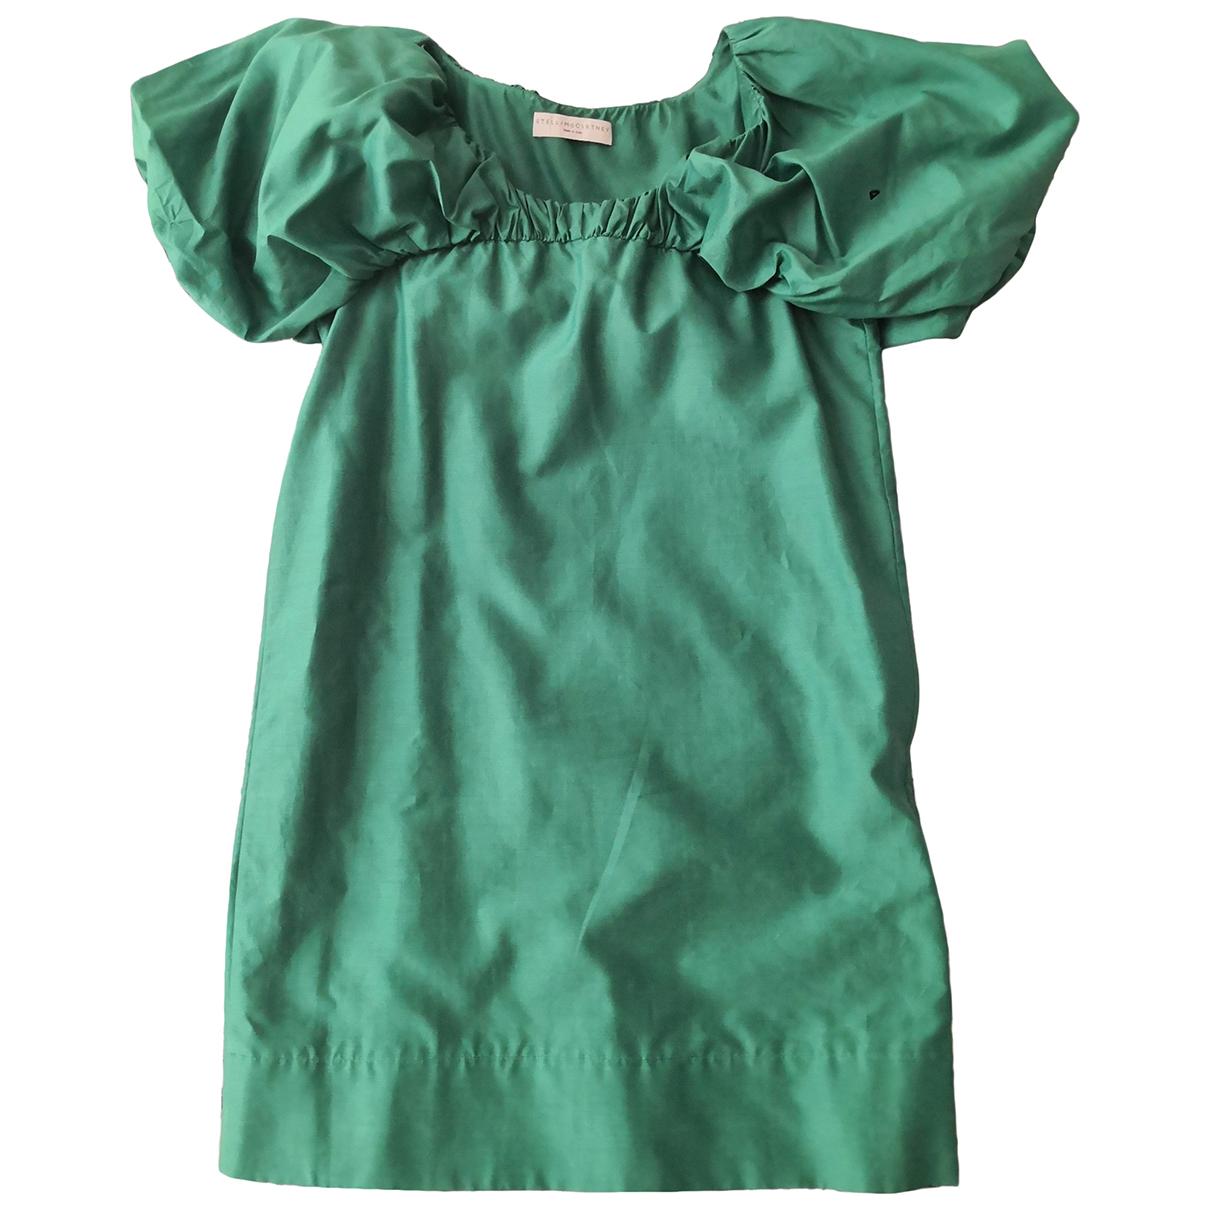 Stella Mccartney \N Kleid in  Gruen Baumwolle